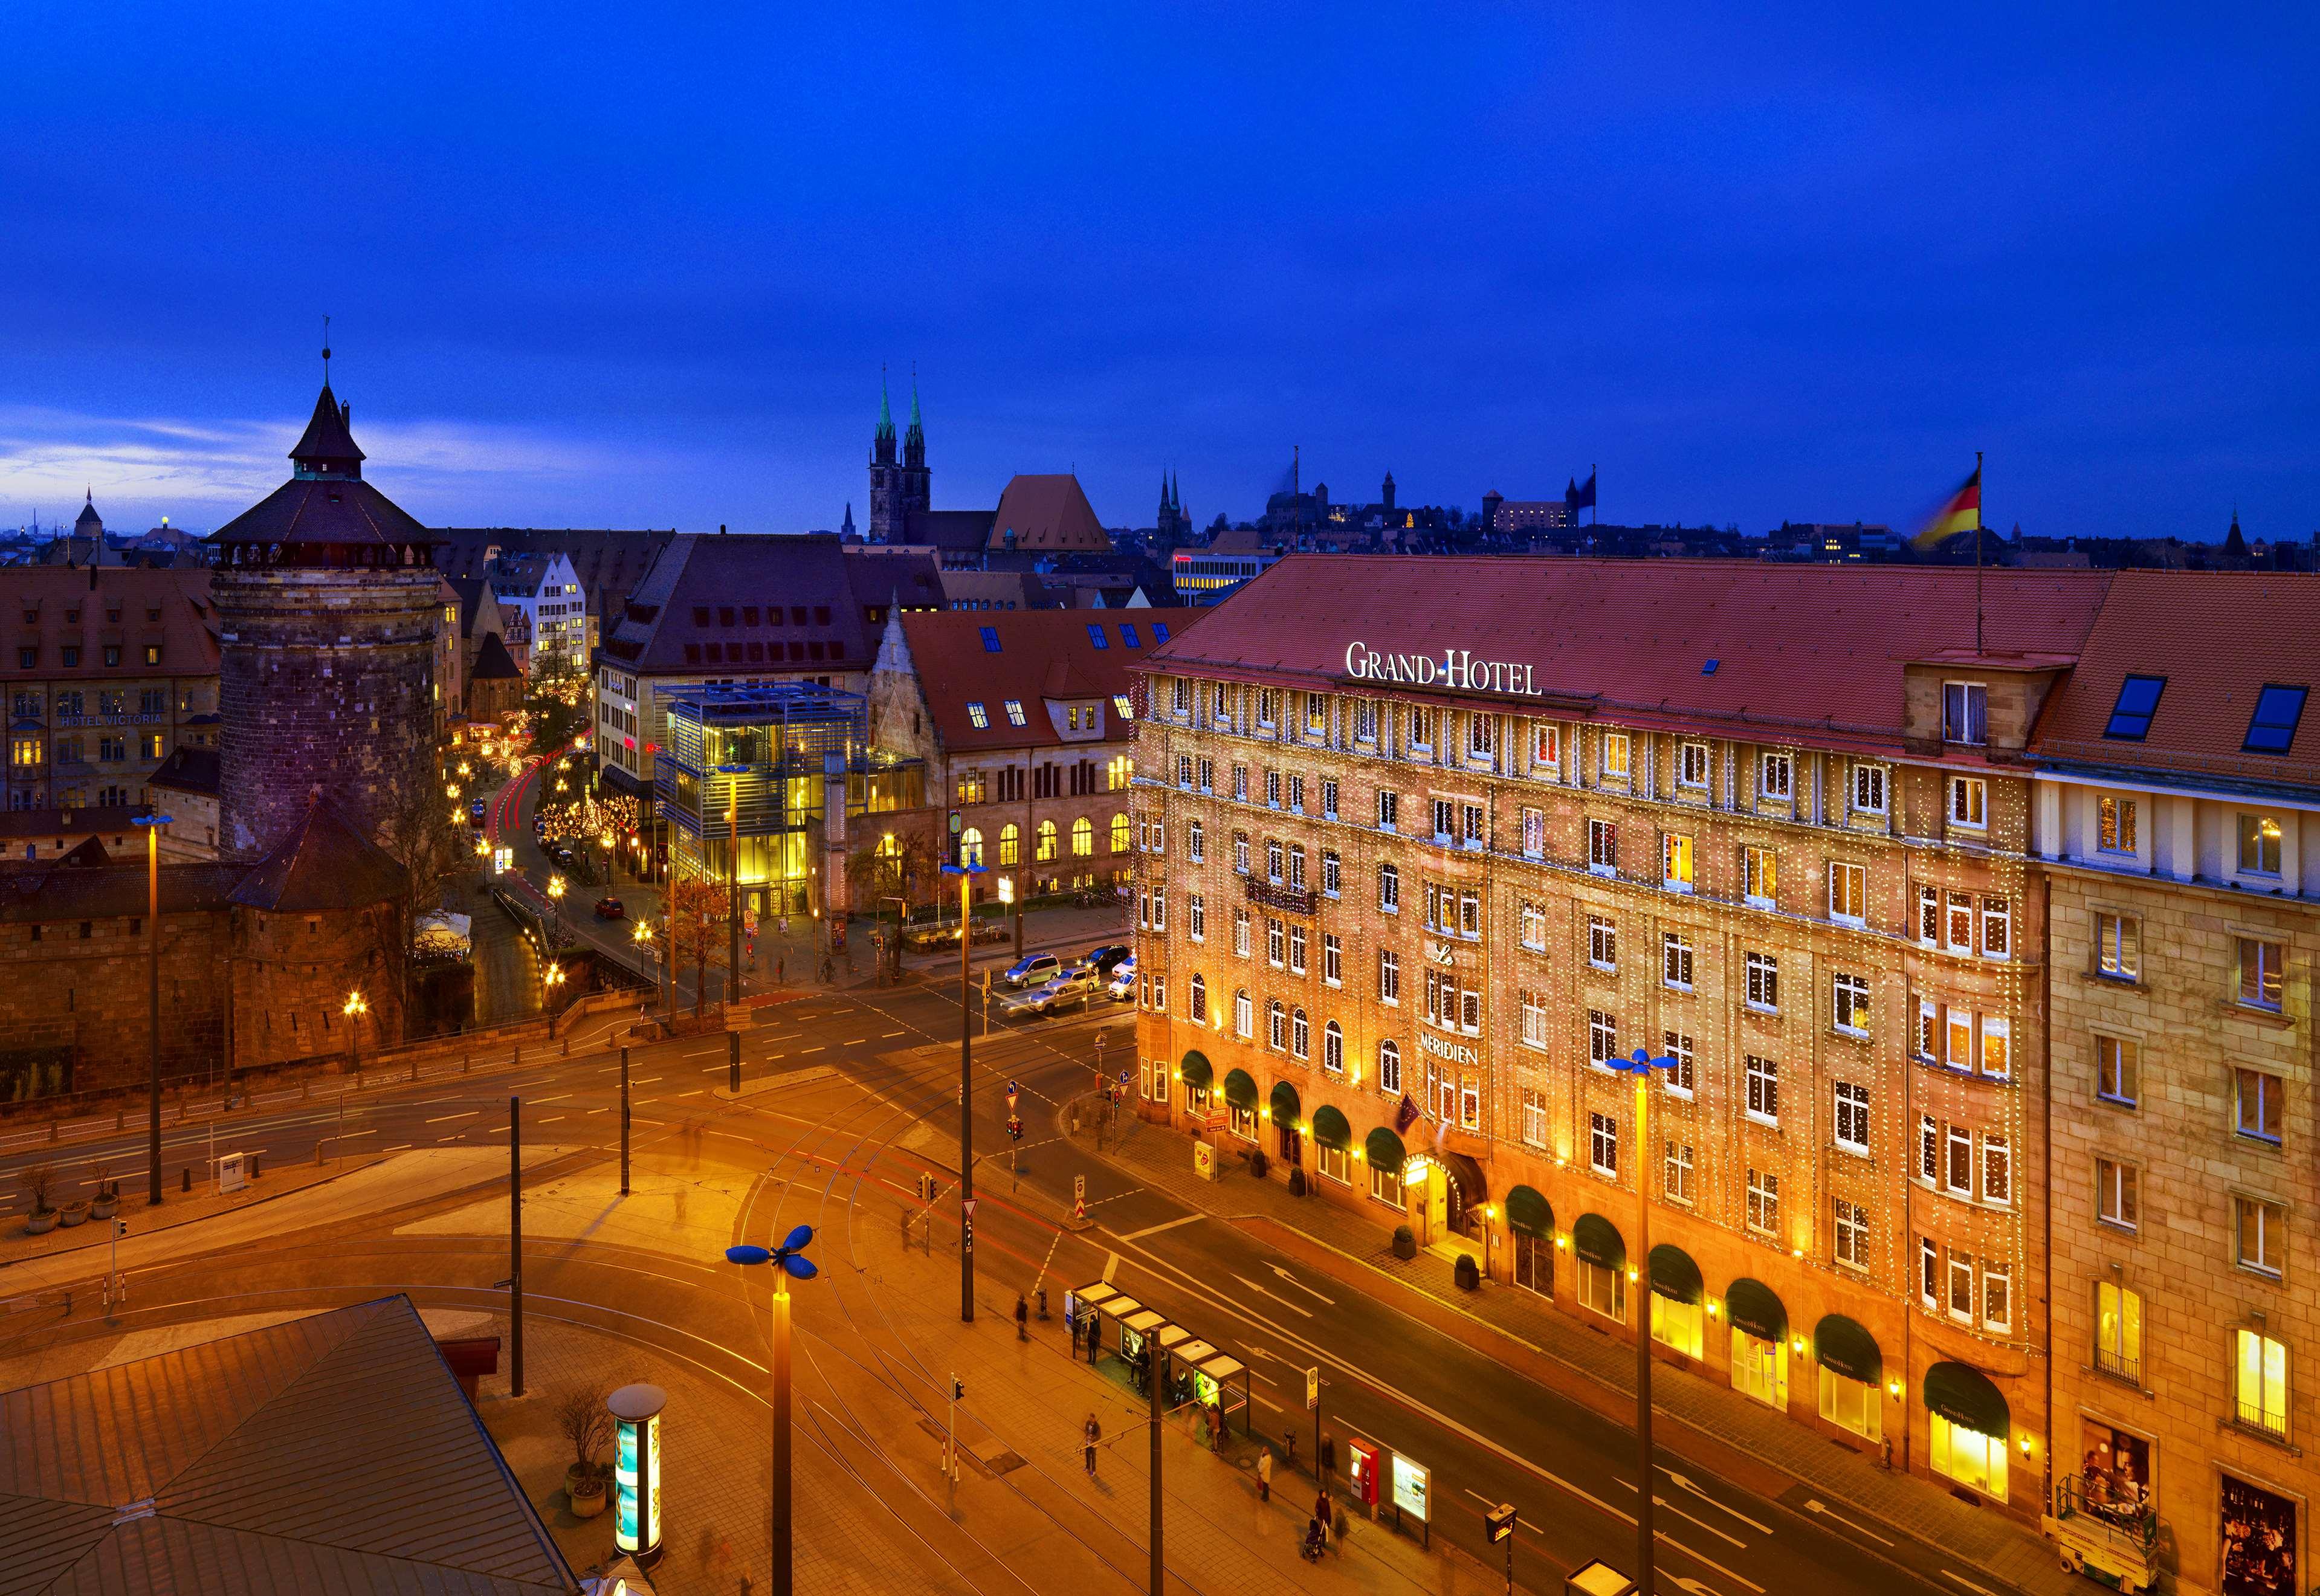 Casino de Paris (Nürnberg) | Kommende Veranstaltungen